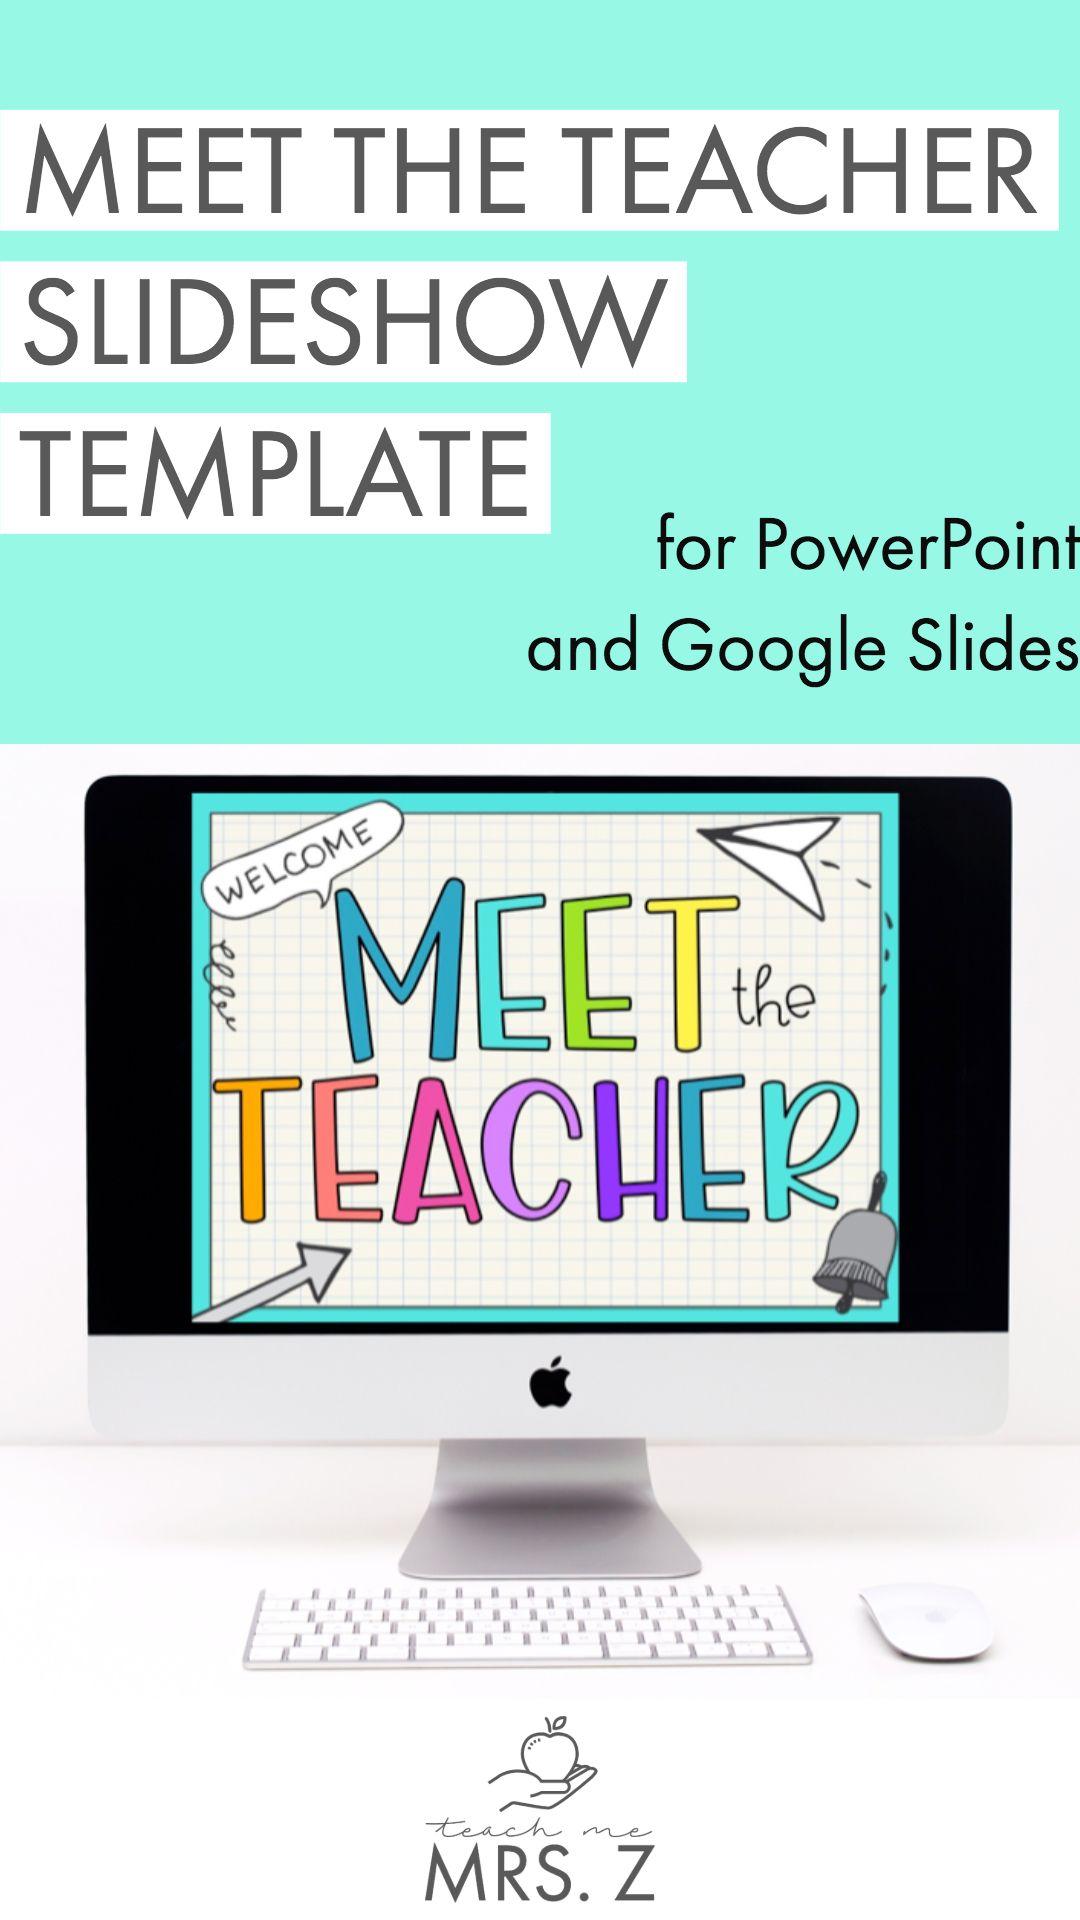 Meet The Teacher Slideshow Template For Powerpoint And Google Slides By Teach Me Mrs Z Digital Learning Classroom Google Classroom Teachers Teaching